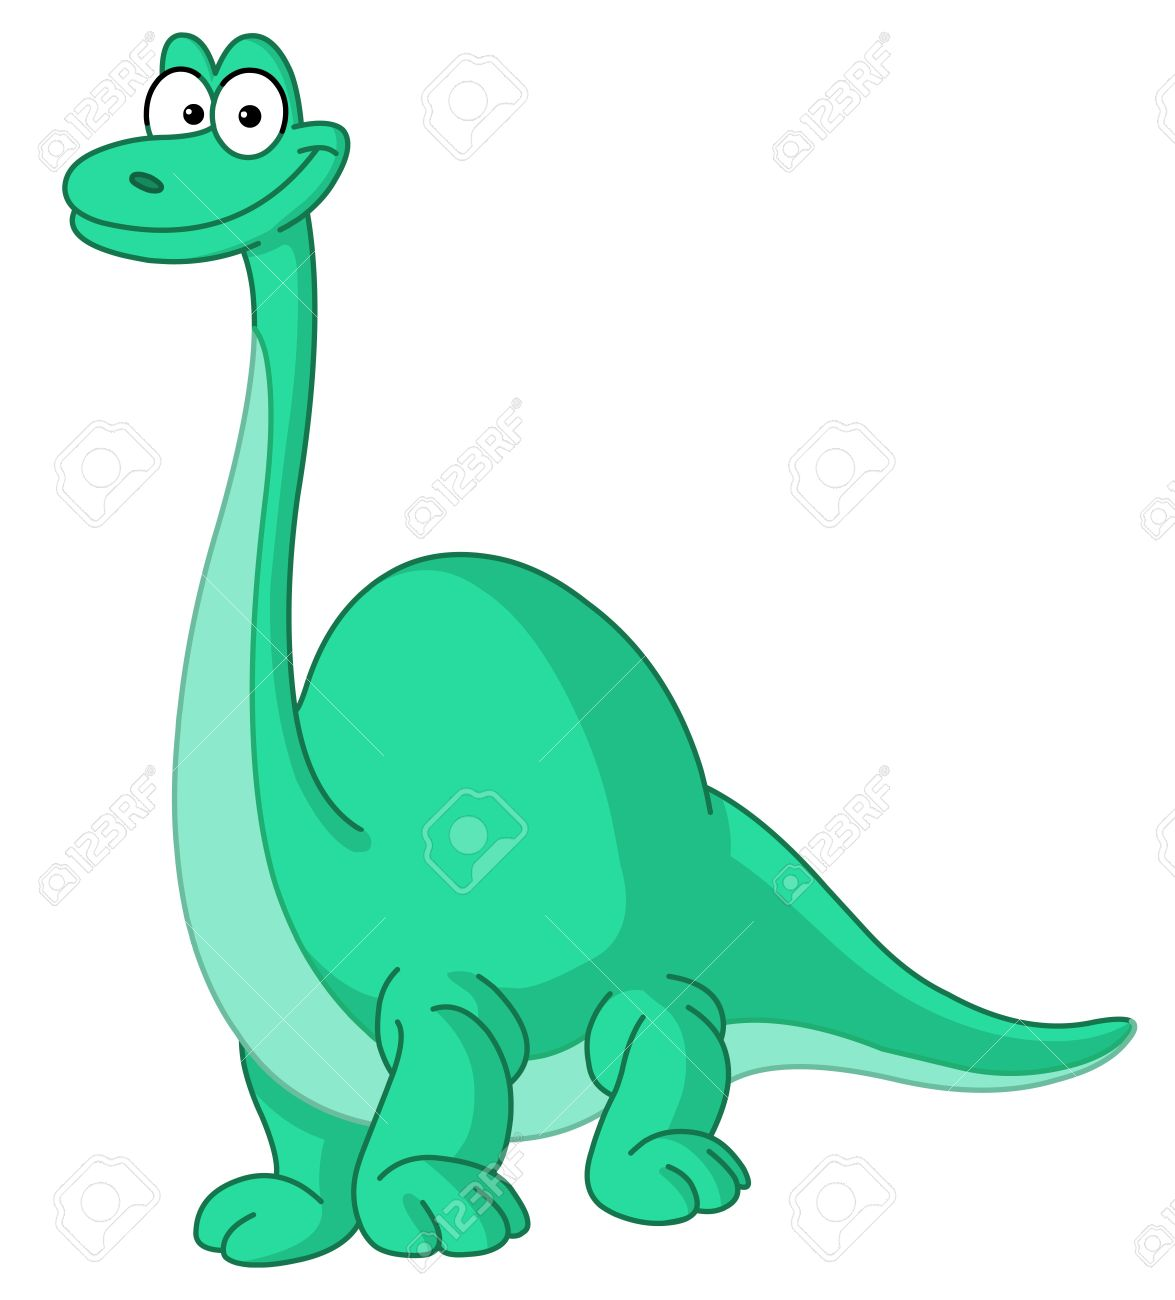 Brachiosaurus clipart #6, Download drawings